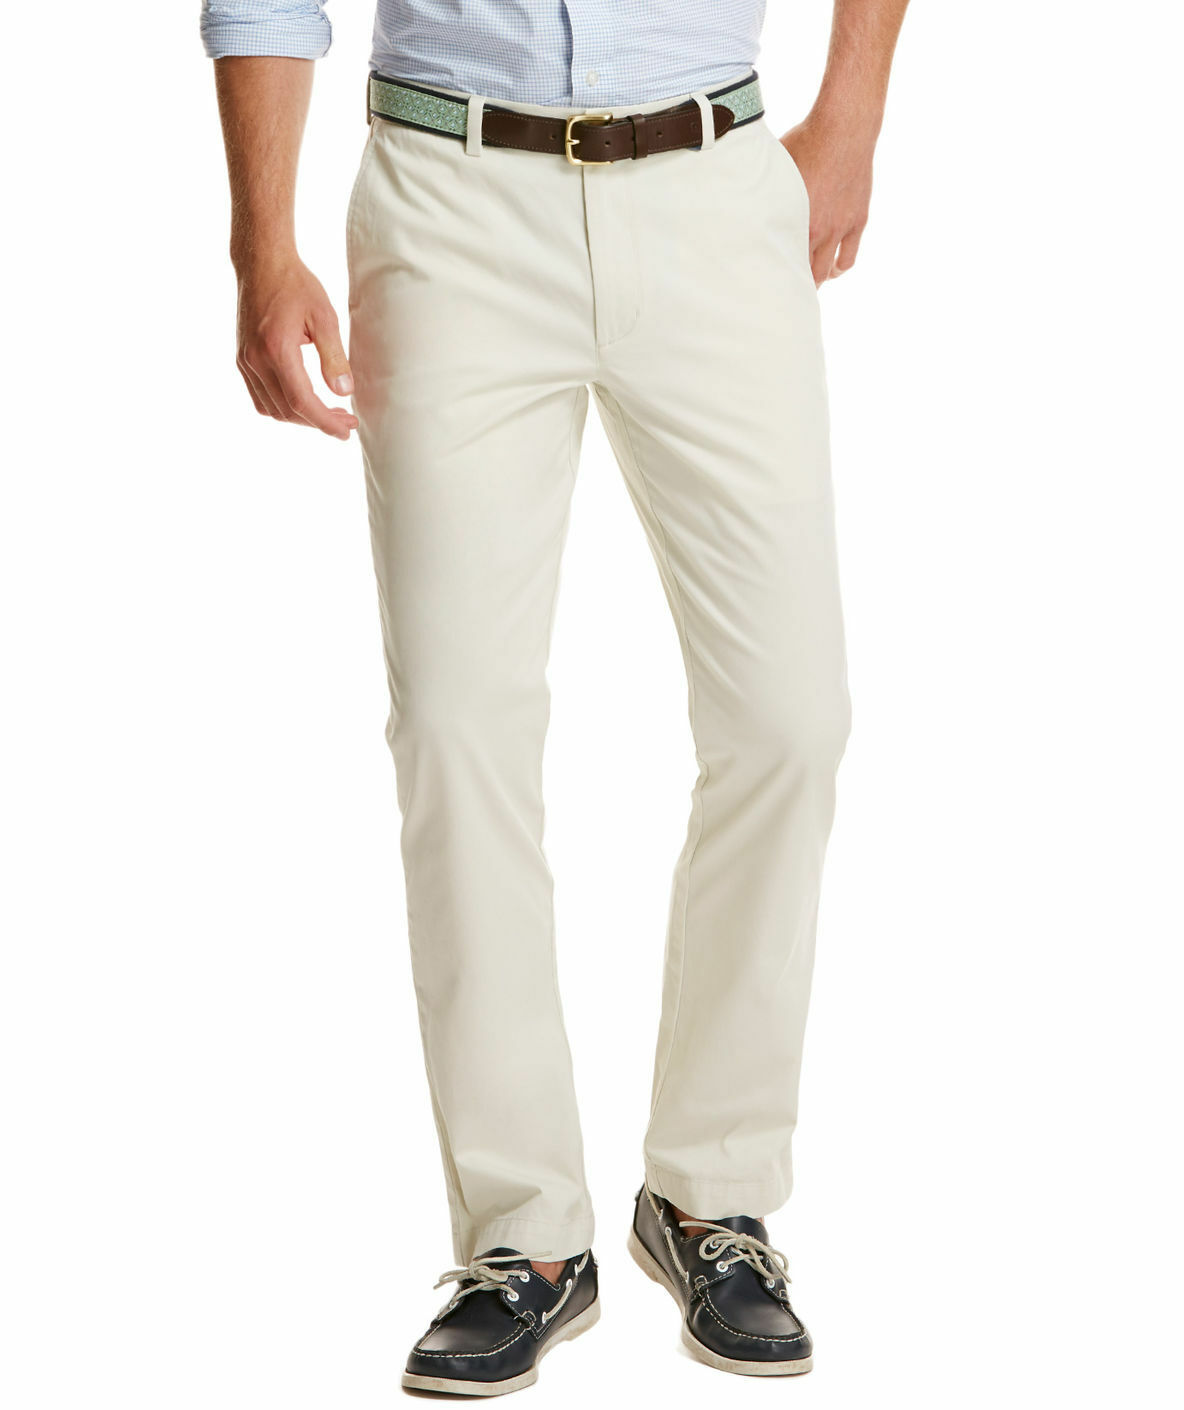 VINEYARD VINES White Cotton Pants 42 x 27 Slim Fit Breaker